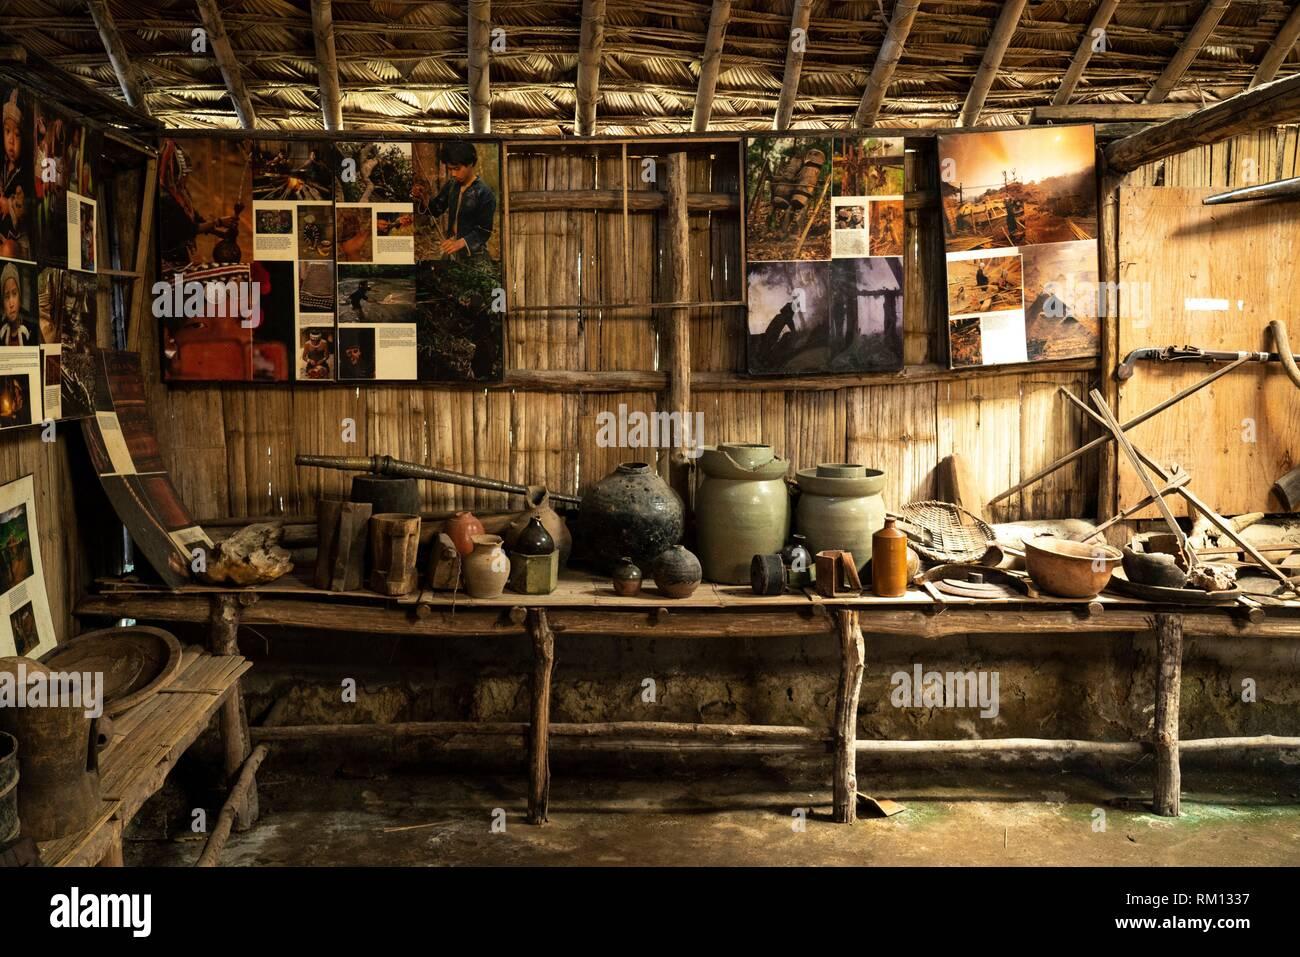 Hmong's Hilltribe Museum, Doi Pui, Chiang Mai, Thailand - Stock Image